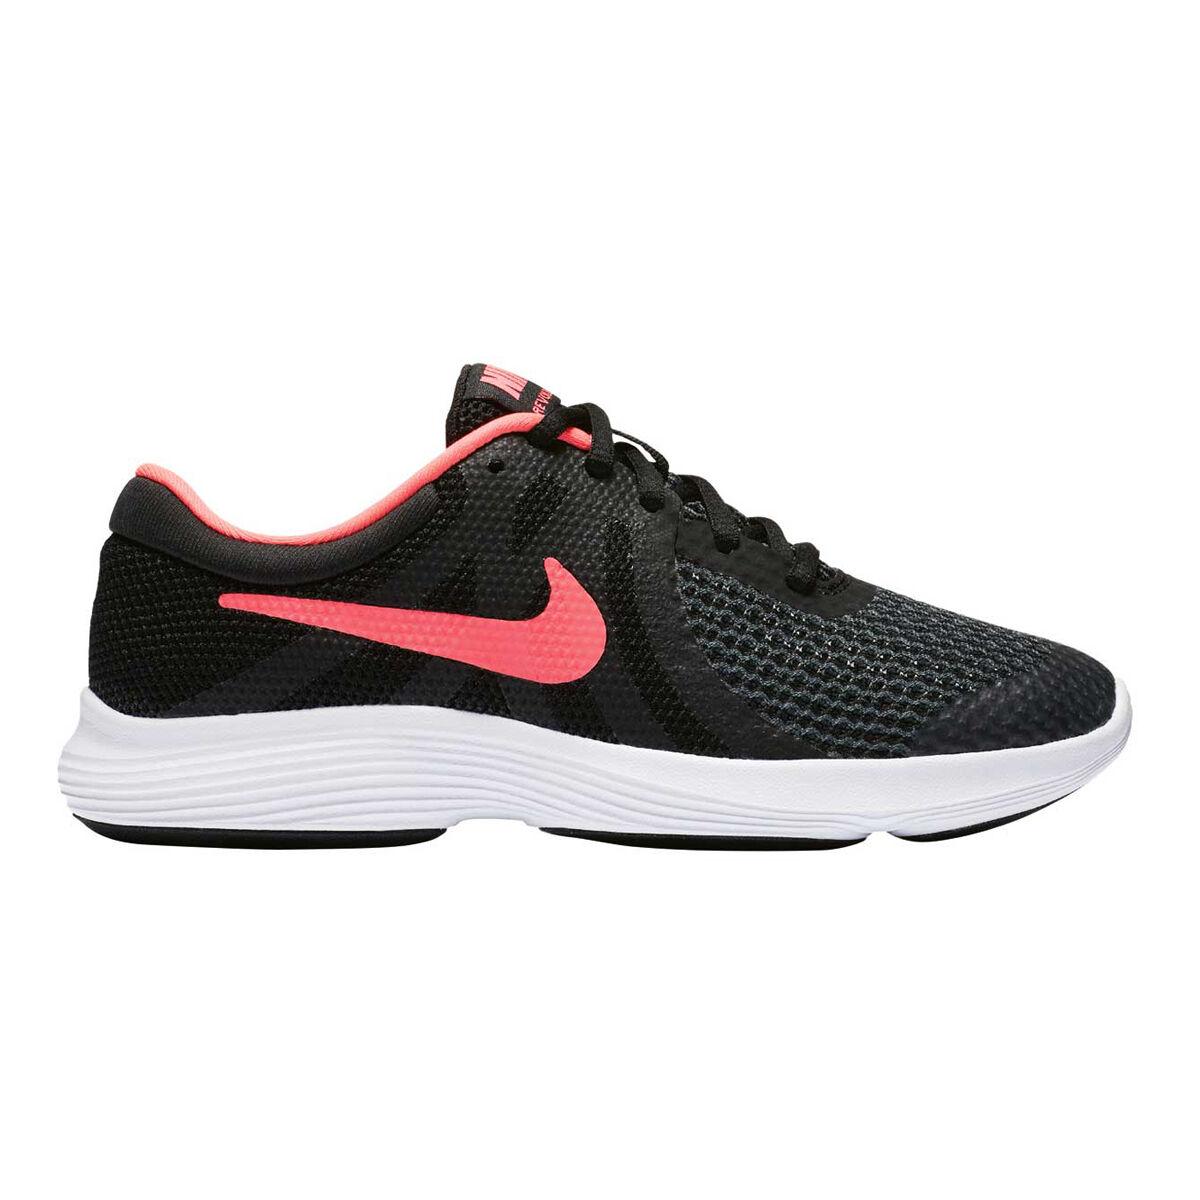 5Rebel 4 Black Pink Revolution Girls Nike Running Us Shoes Sport sdxQrCtBh